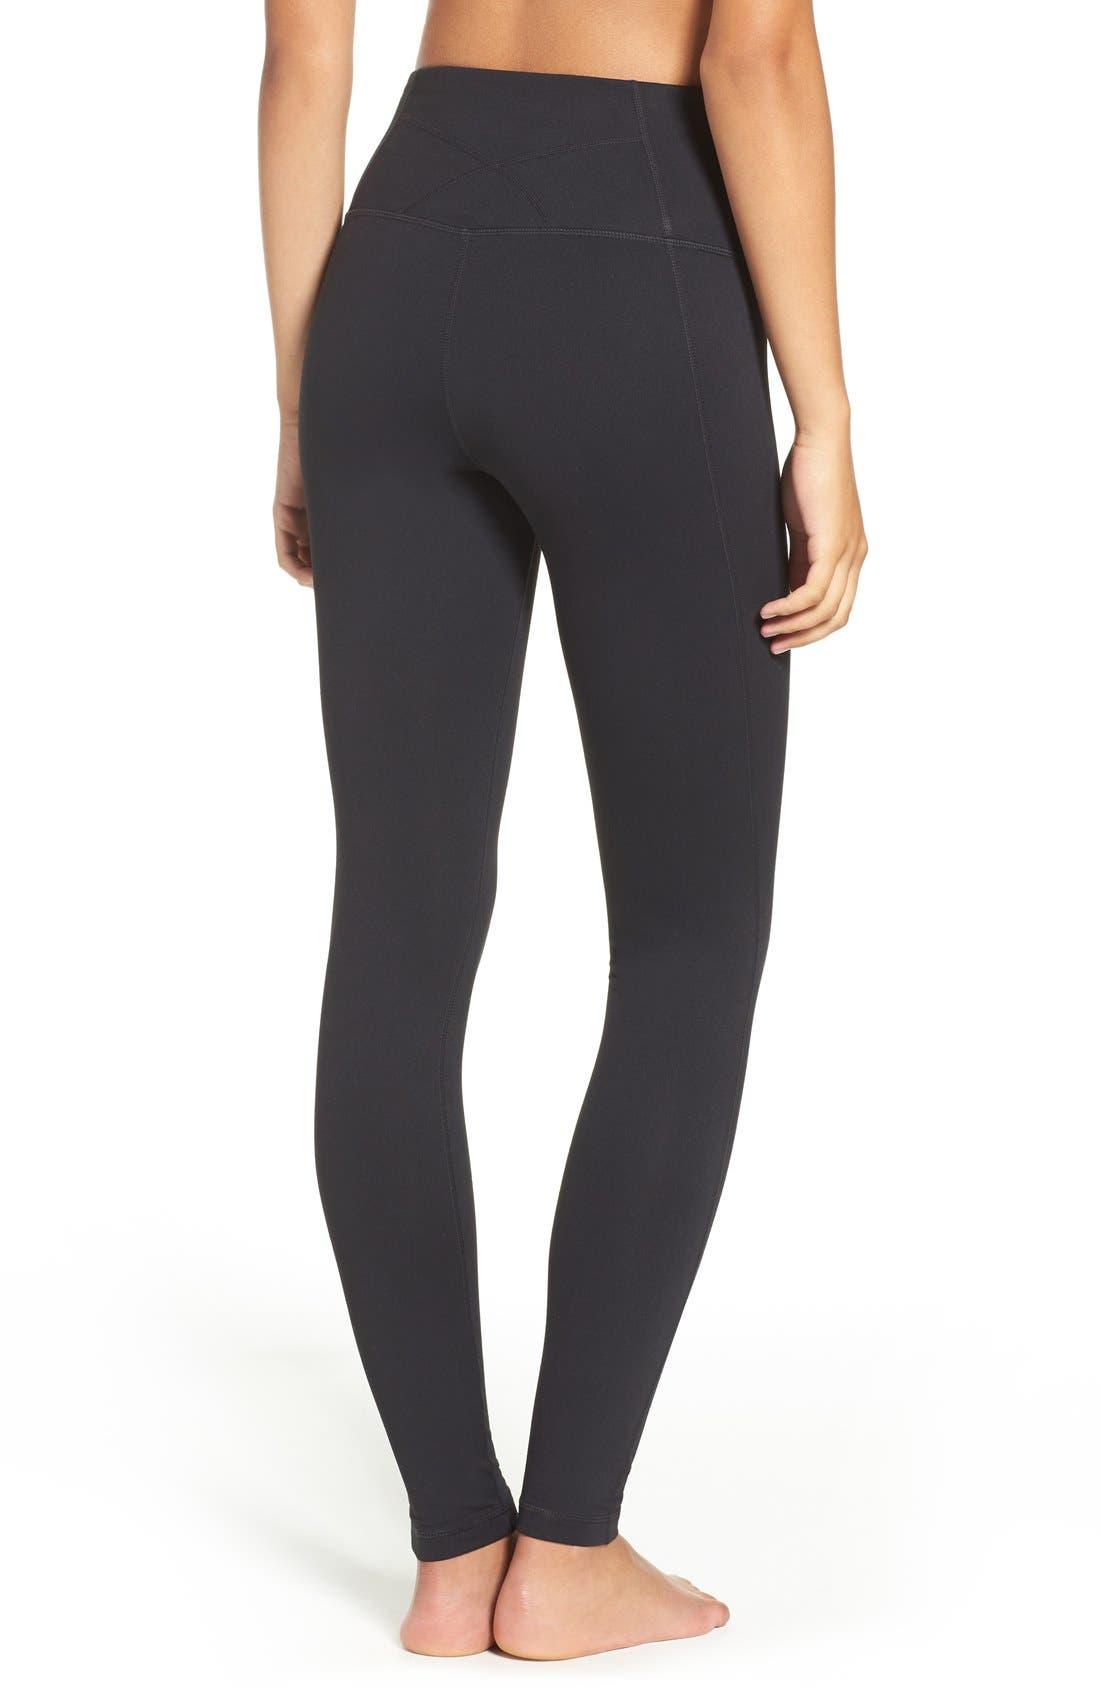 314d8dfb20ac Zella Activewear for Women